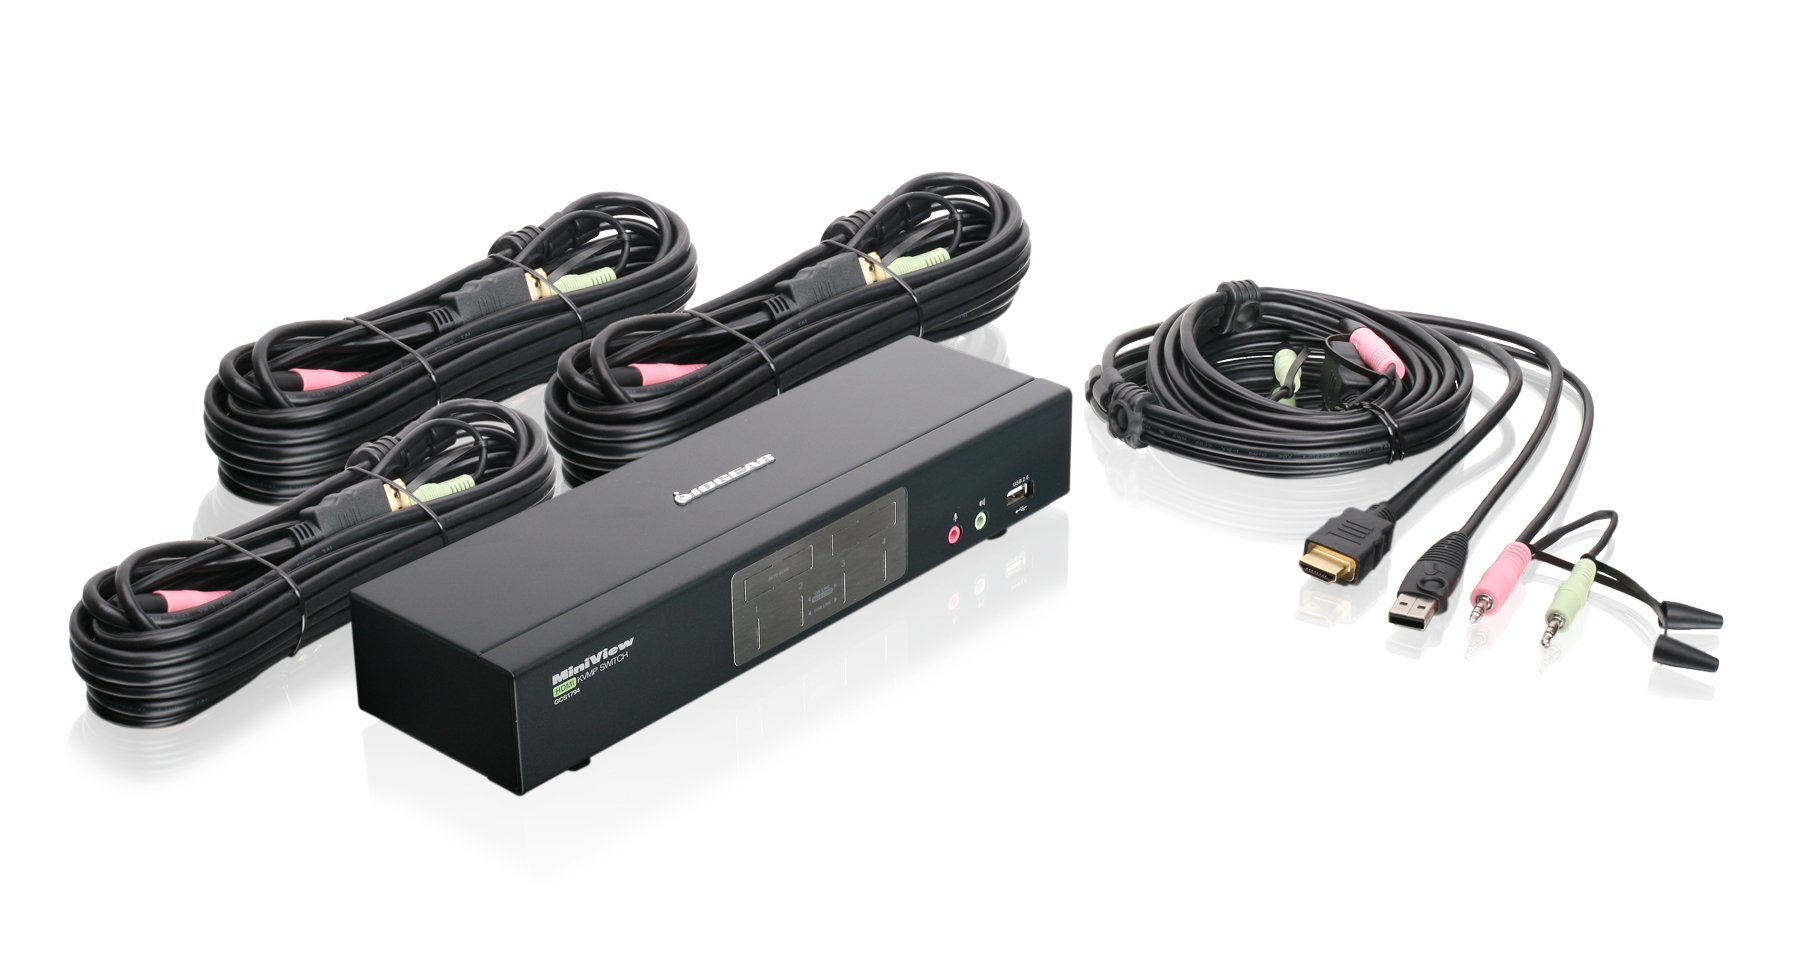 IOGEAR 4-Port HDMI Multimedia KVM Switch with Audio, USB 2.0 Hub and HDMI KVM w/Full Set of Cables, (GCS1794 TAA Compliant) by IOGEAR